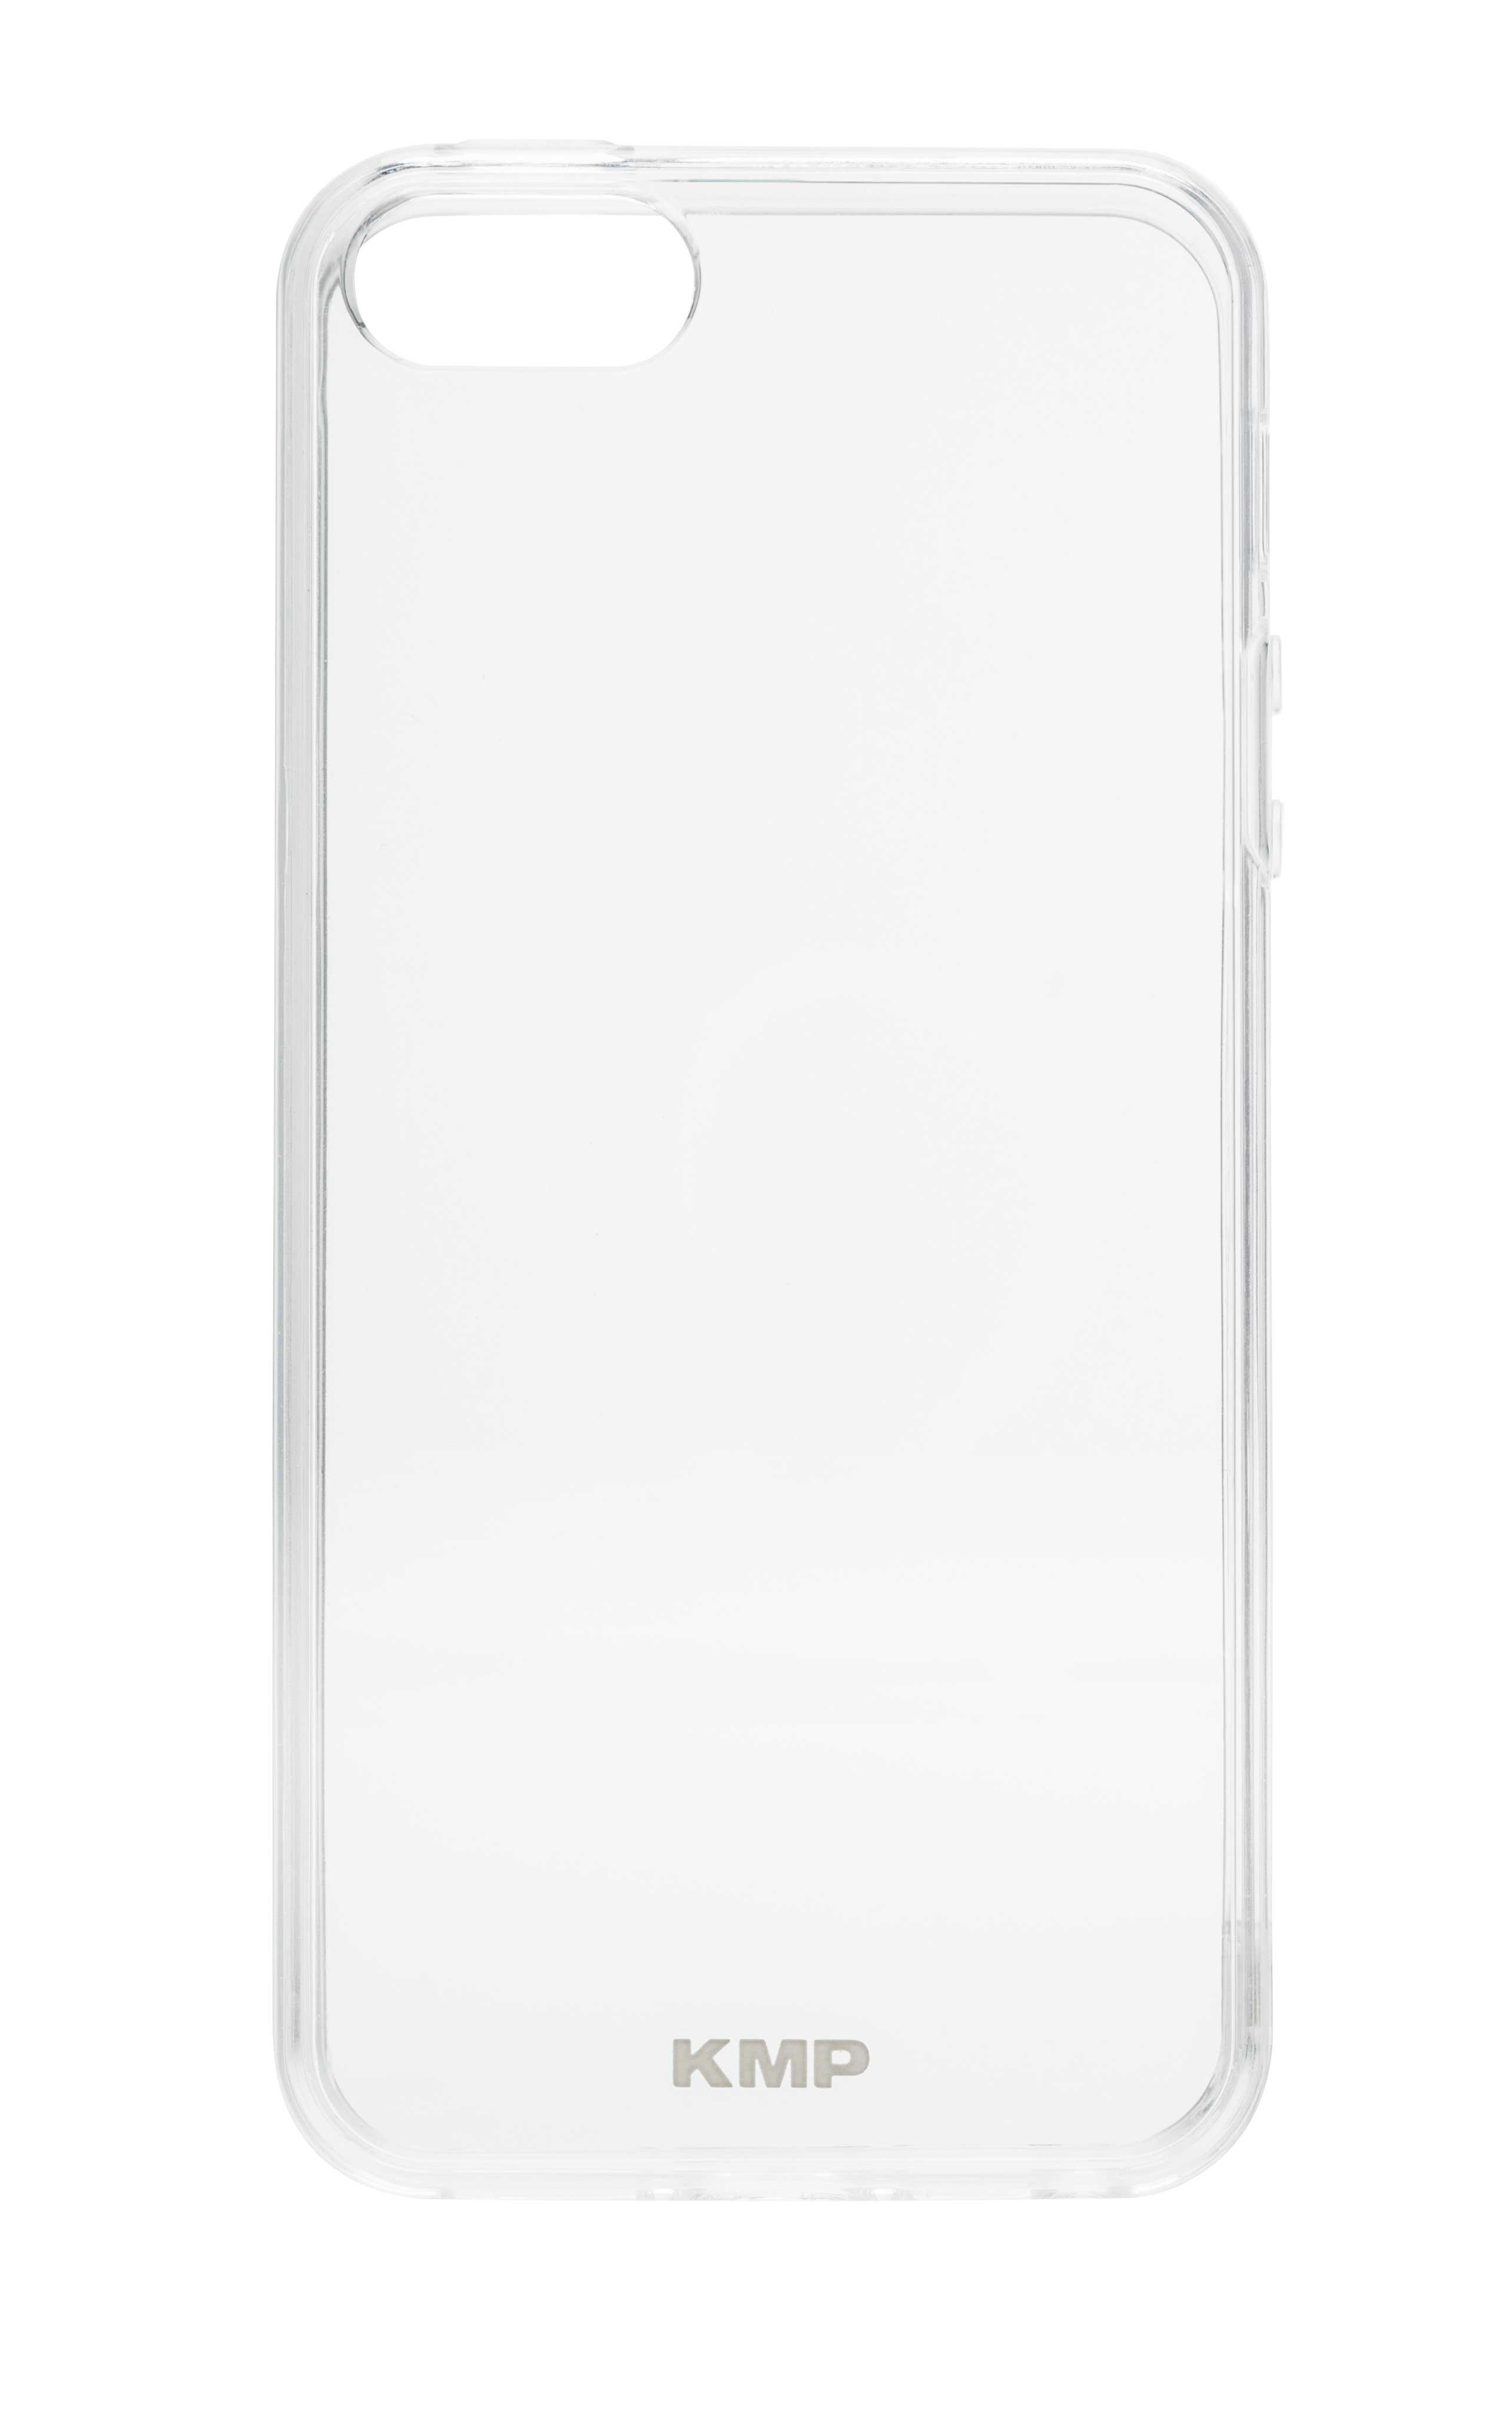 KMP Schutzhülle für Apple iPhone 5, 5s transparent